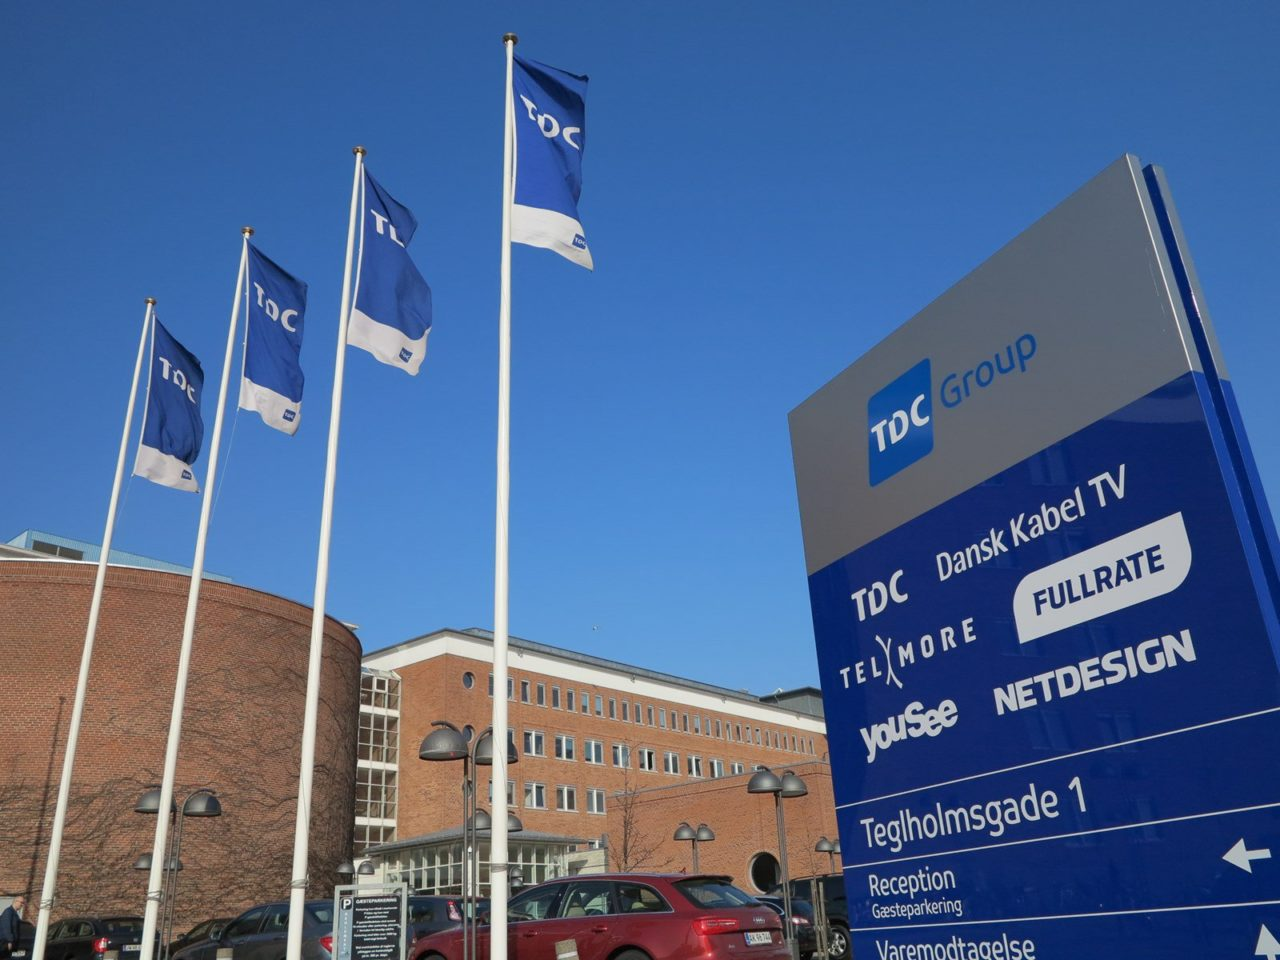 TDC Group headquarters in Cophenhagen, Denmark. Photo: TDC Group.